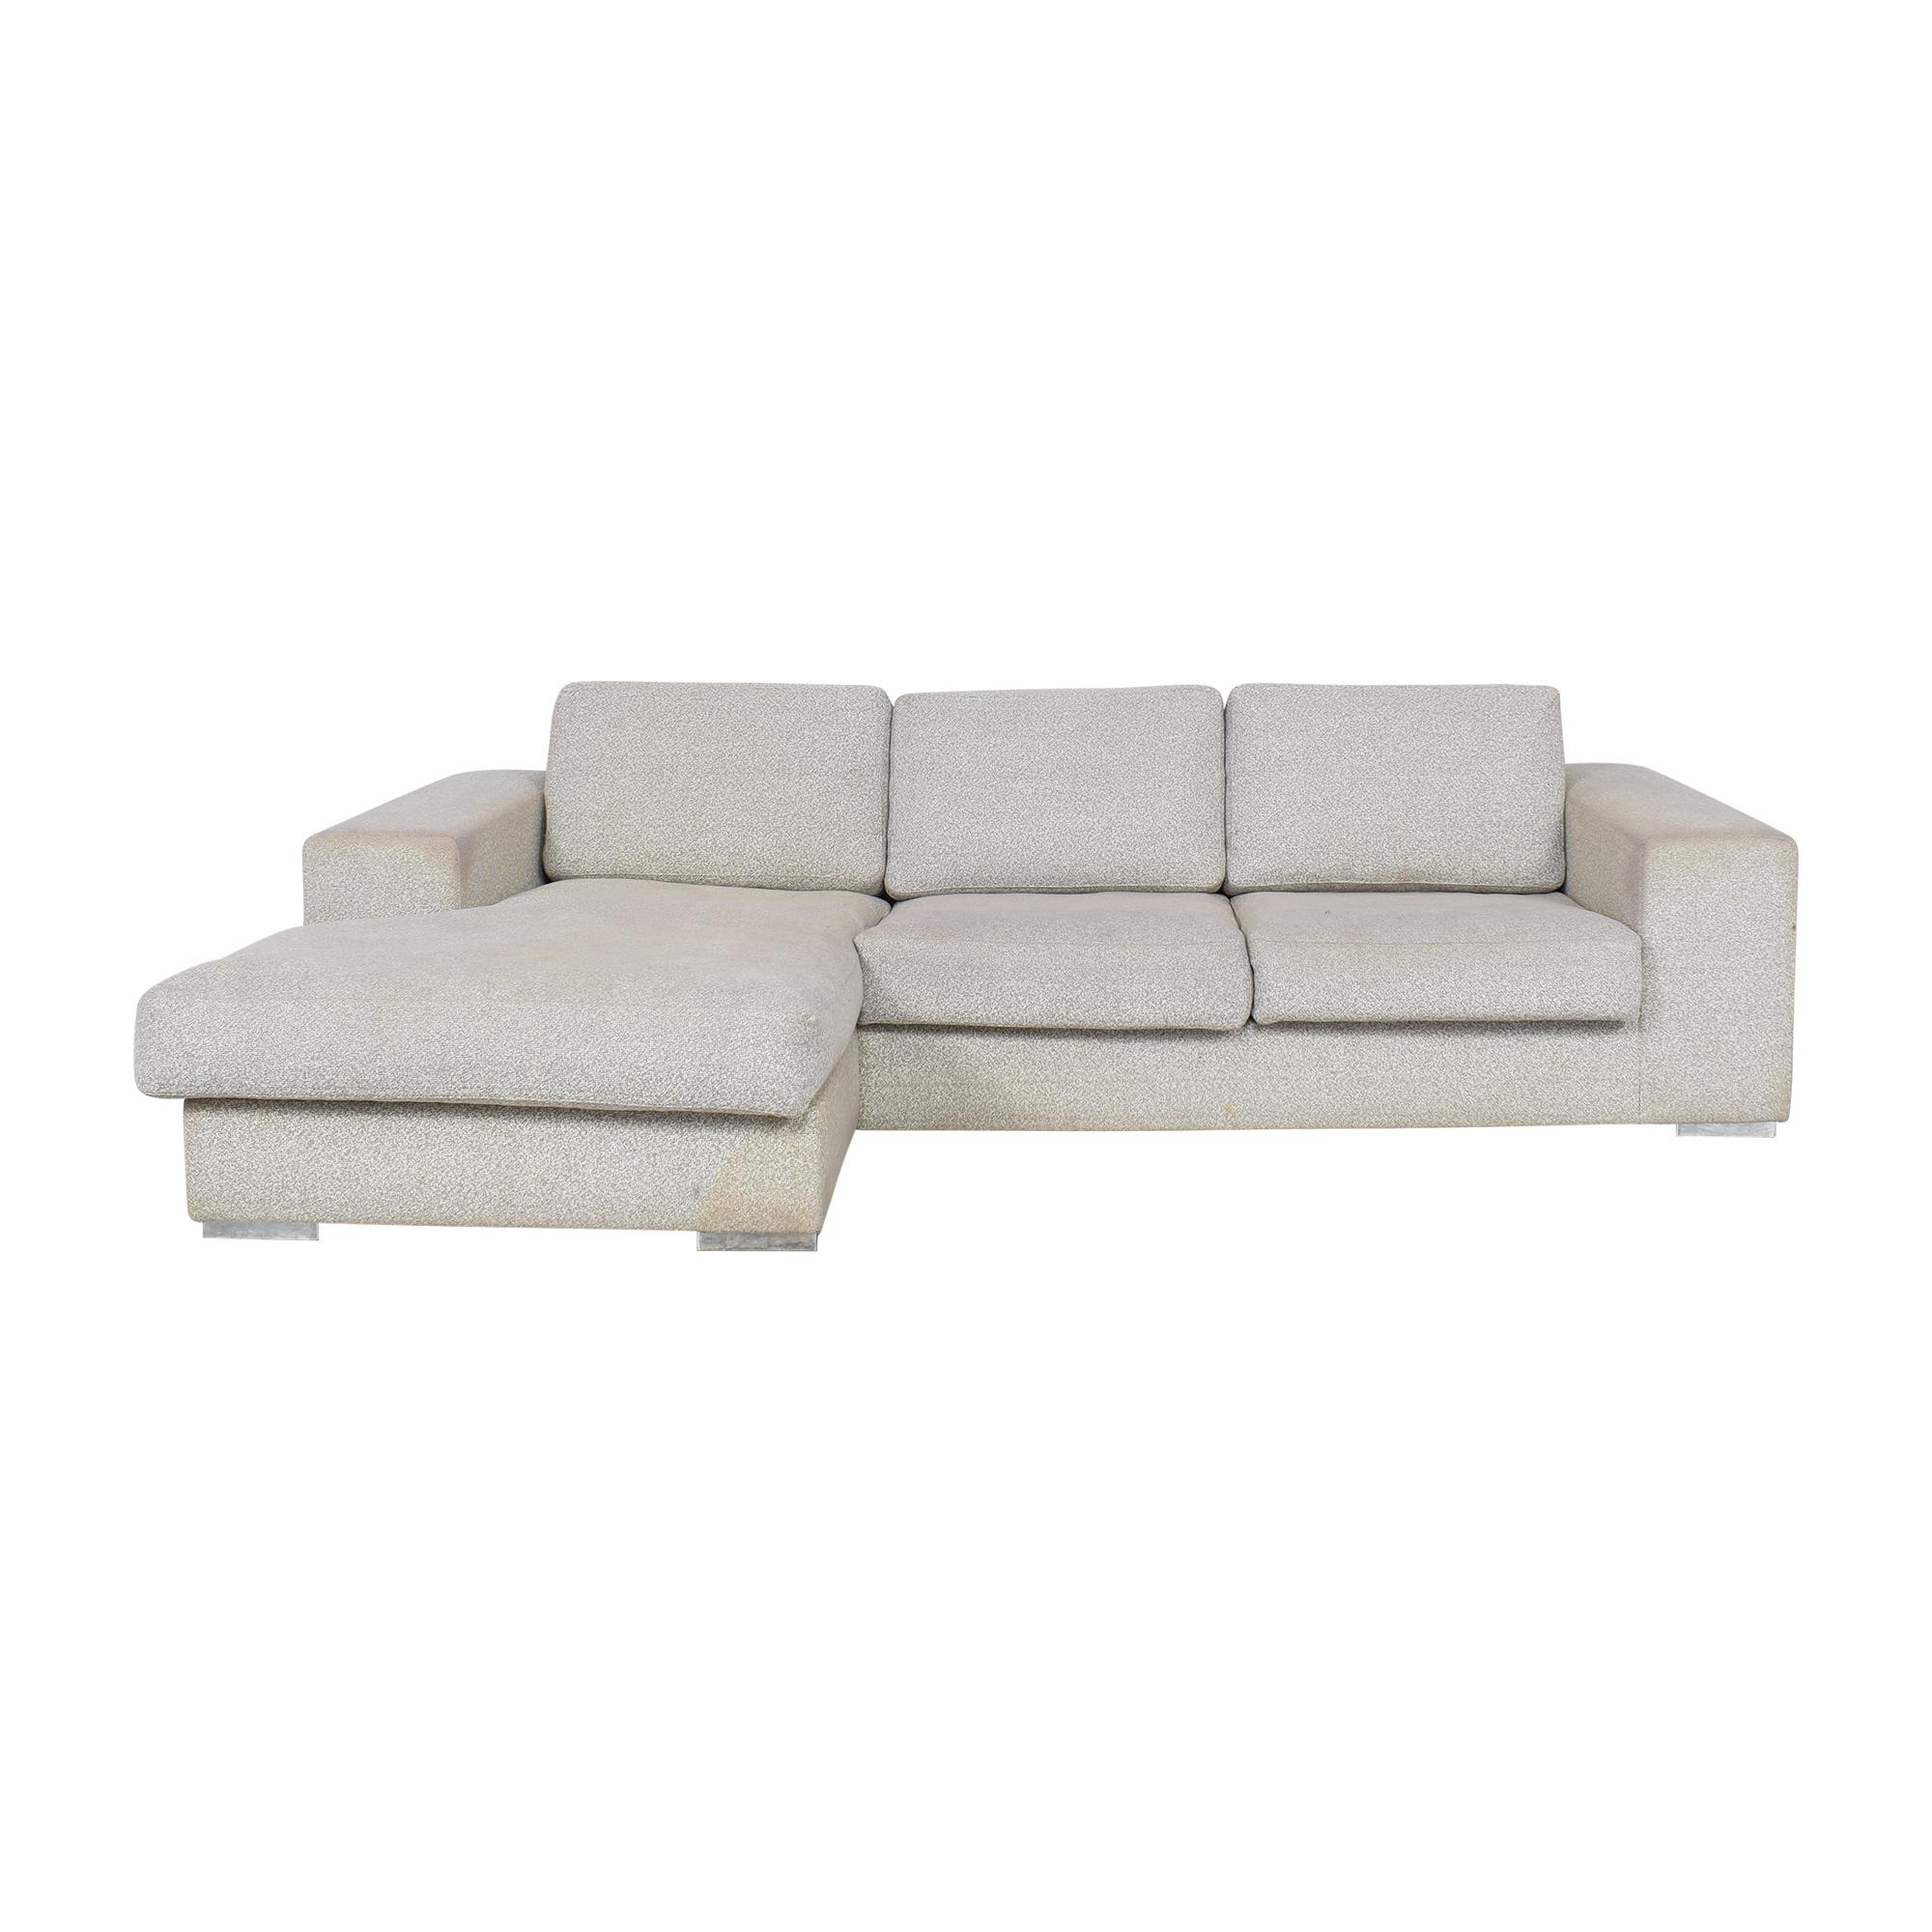 BoConcept BoConcept Chaise Sectional Sofa for sale